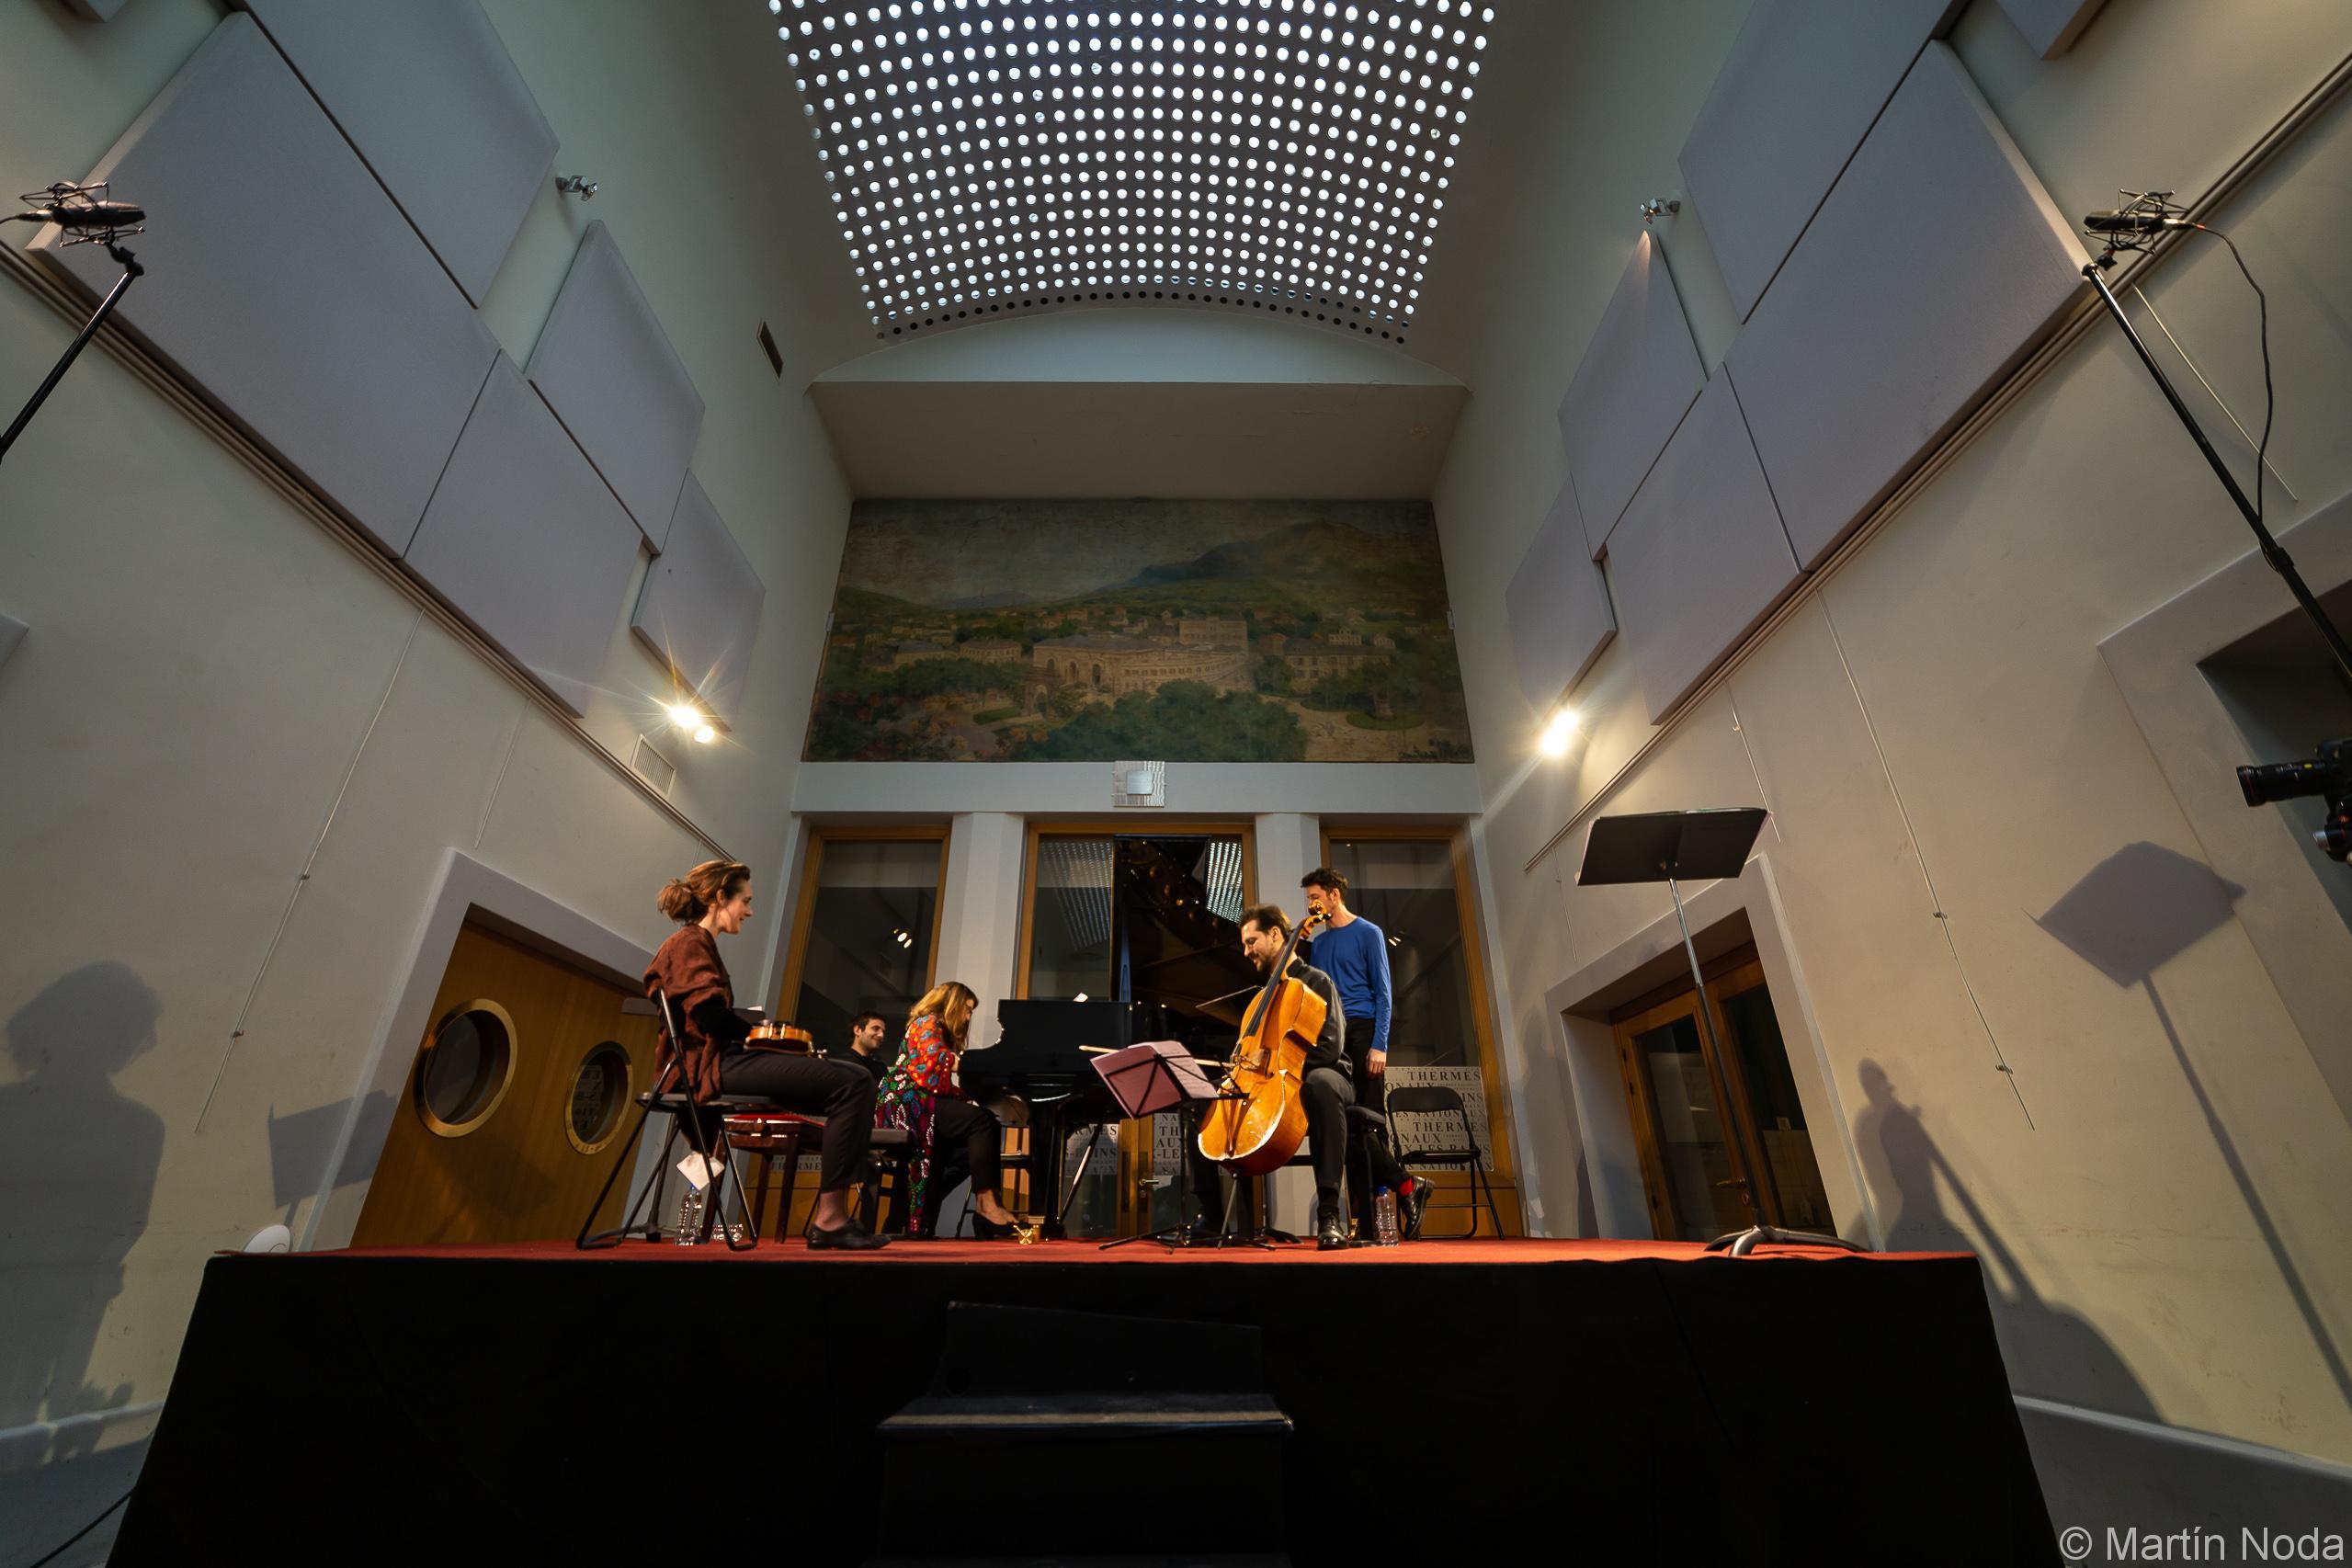 Susan Manoff, Fiona Monbet, Gauthier Broutin et Anoine Thiollier